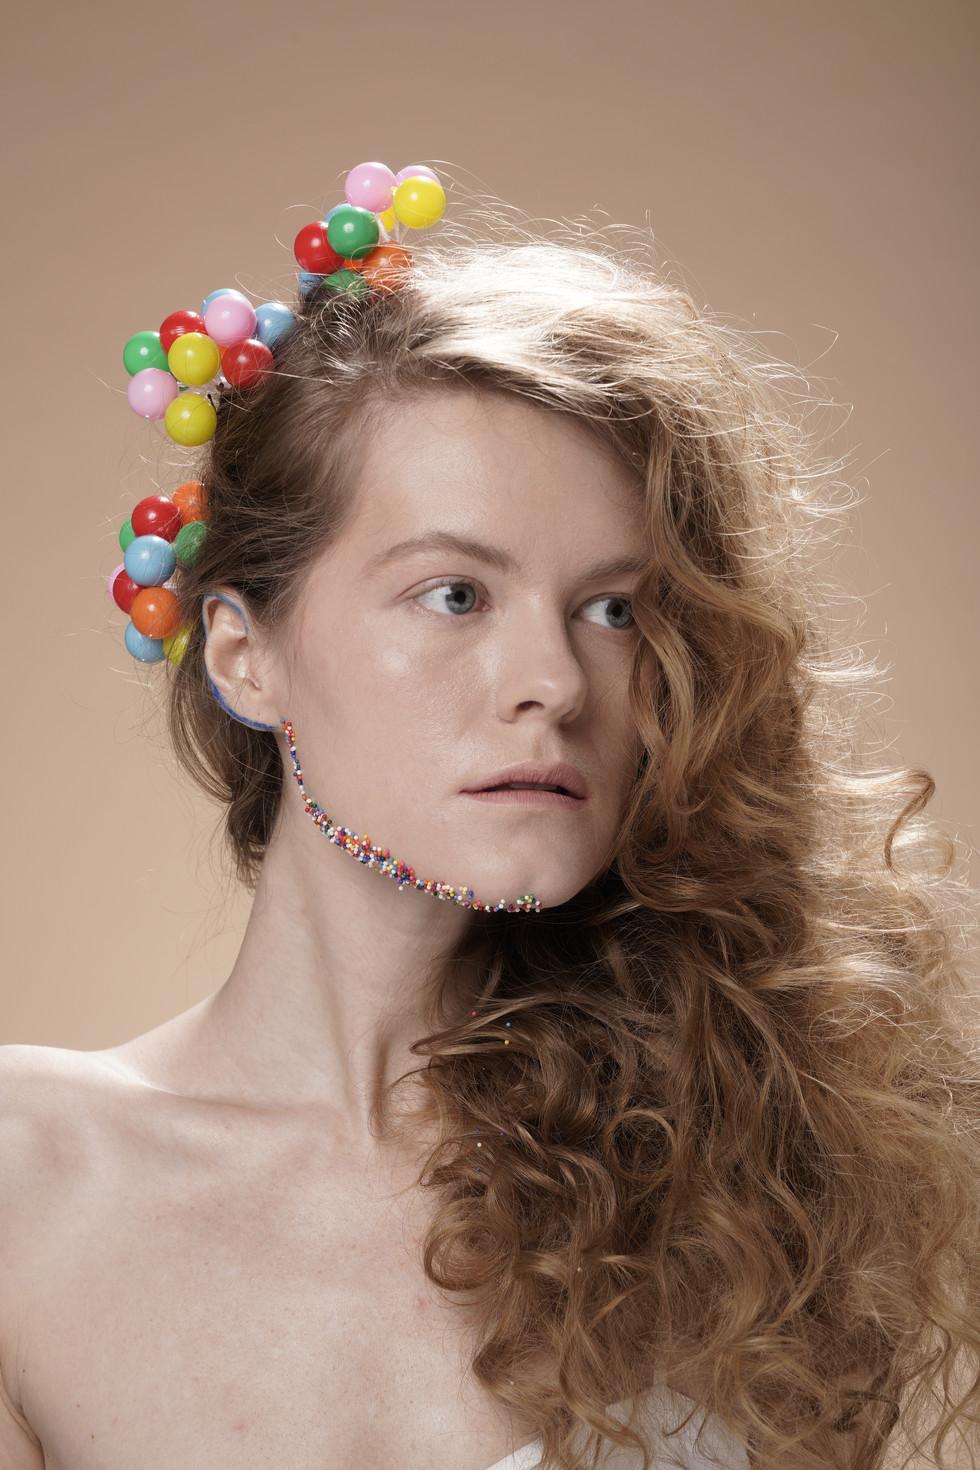 Photography by Alex Villaluz Model Margarita Kamenskaya